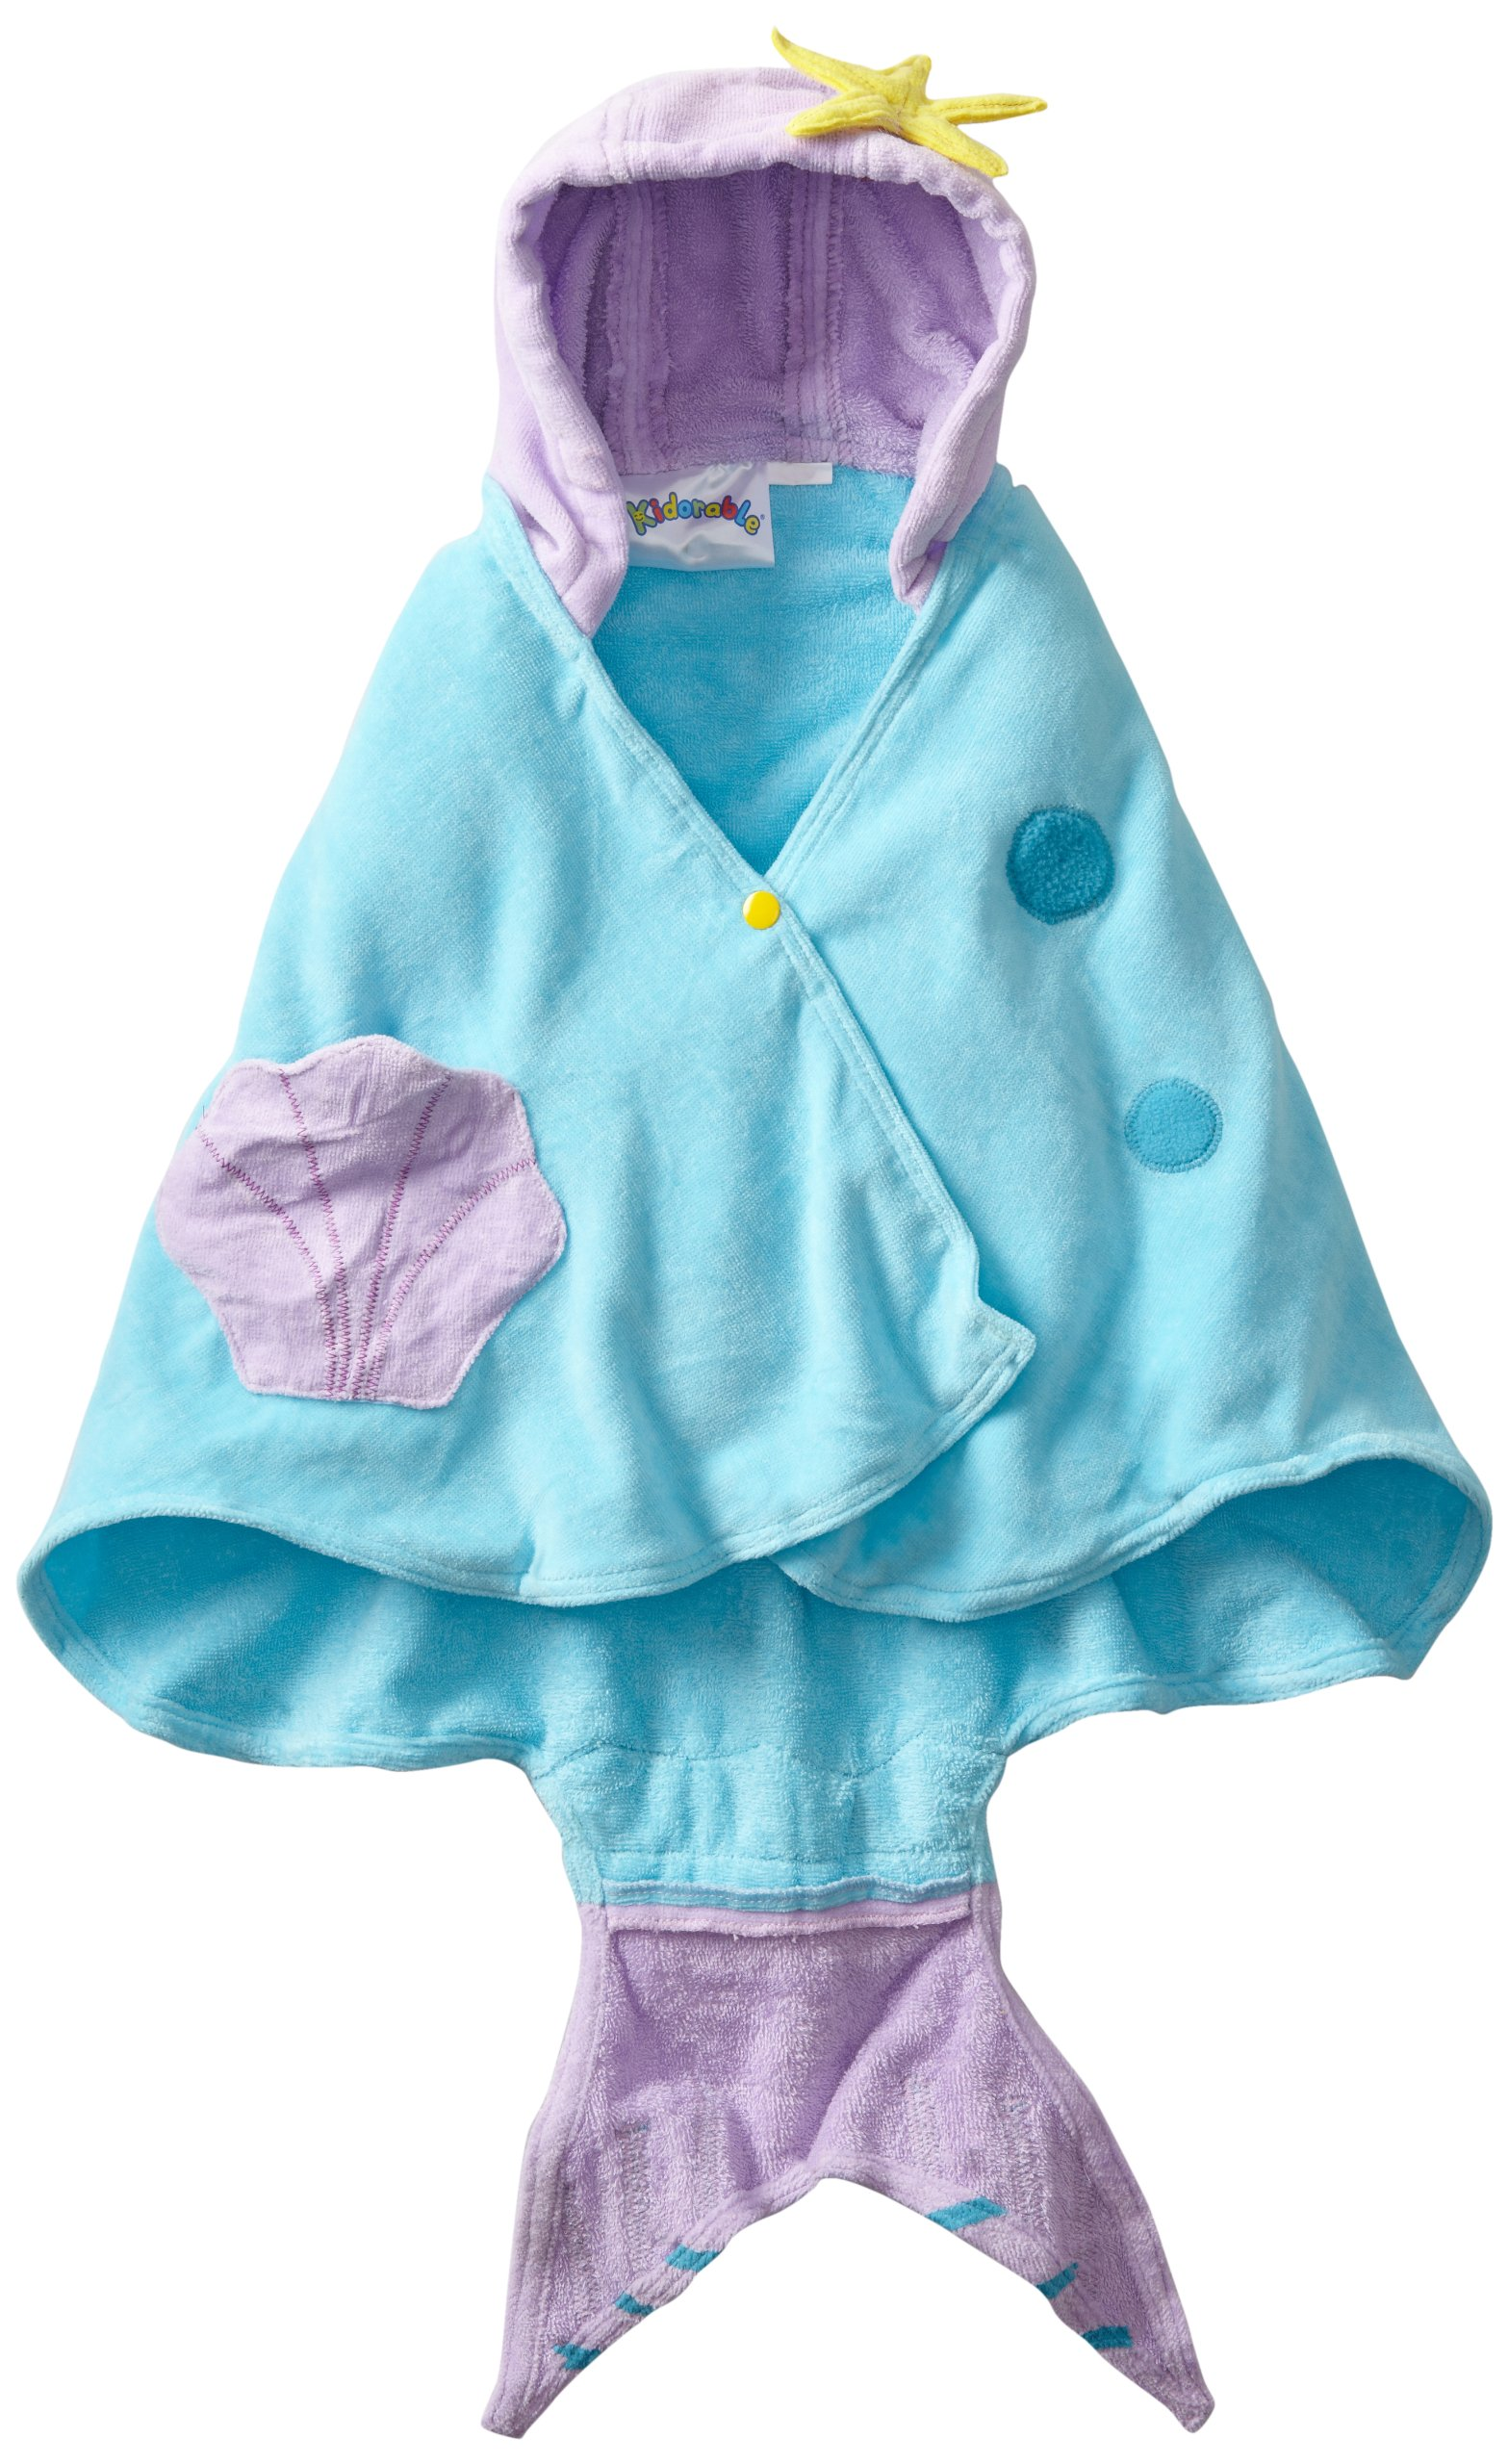 Kidorable - Toalla con capucha para niñas con cola de pescado y conchas 1